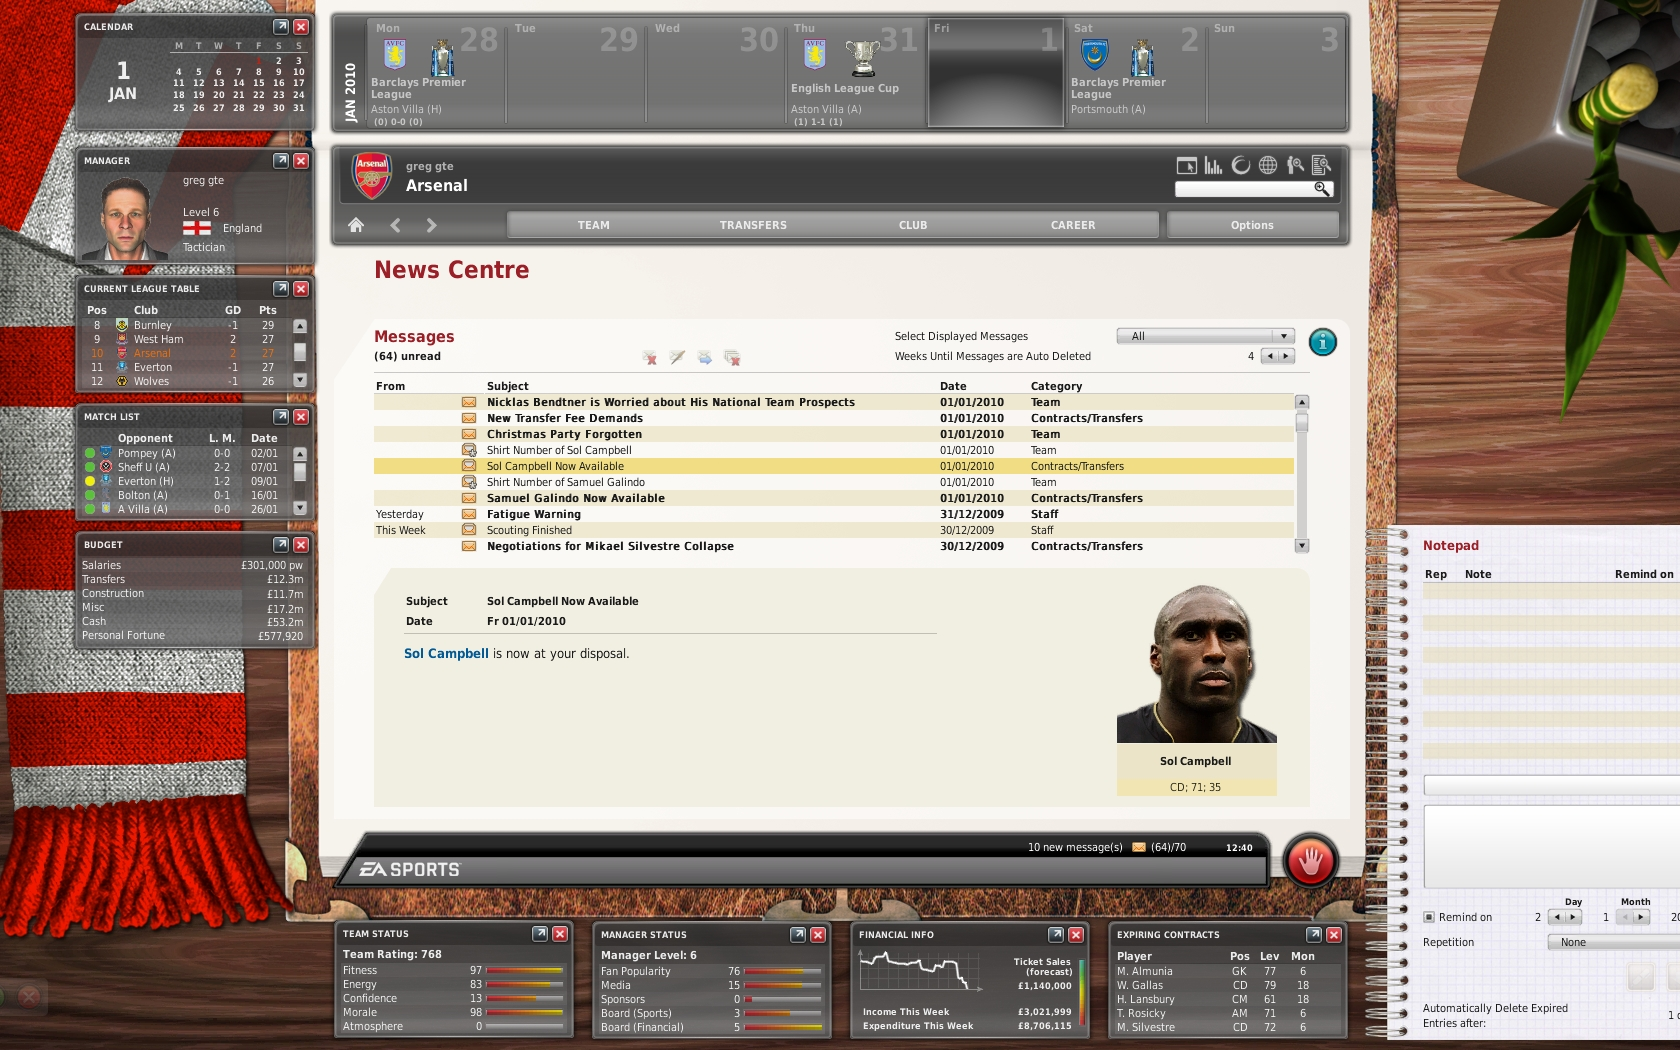 Game Fix / Crack: FIFA Manager 13 v10 All No-DVD